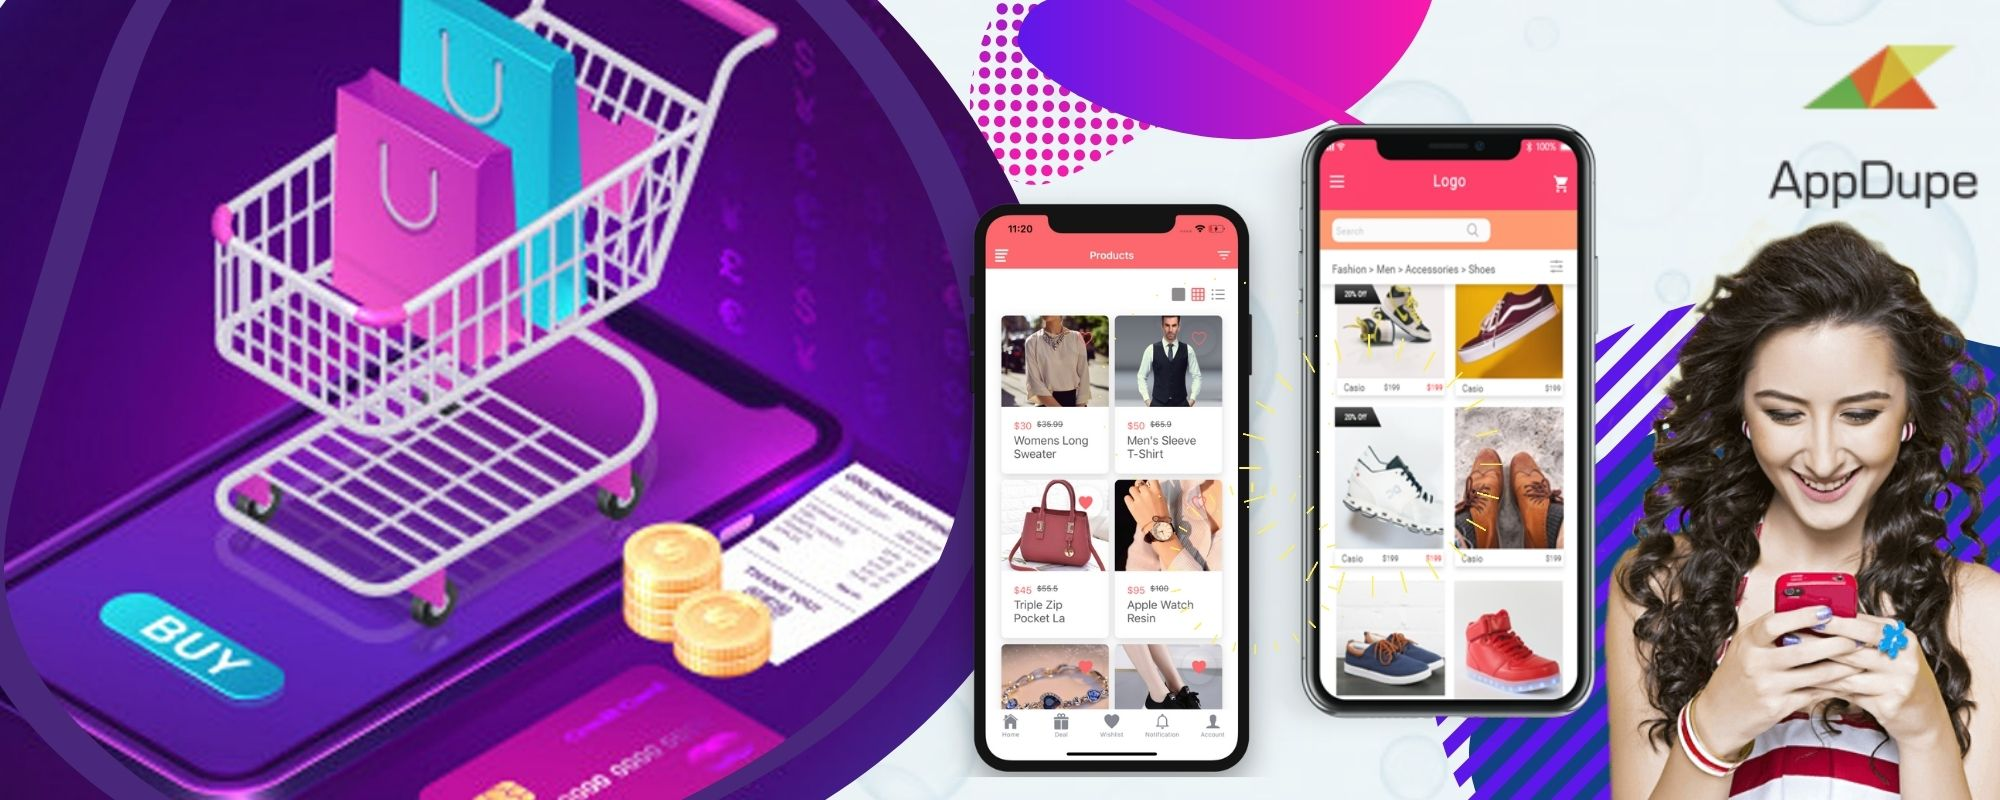 Shopee Clone : Launch A Well-Engineered Ecommerce App Like Shopee